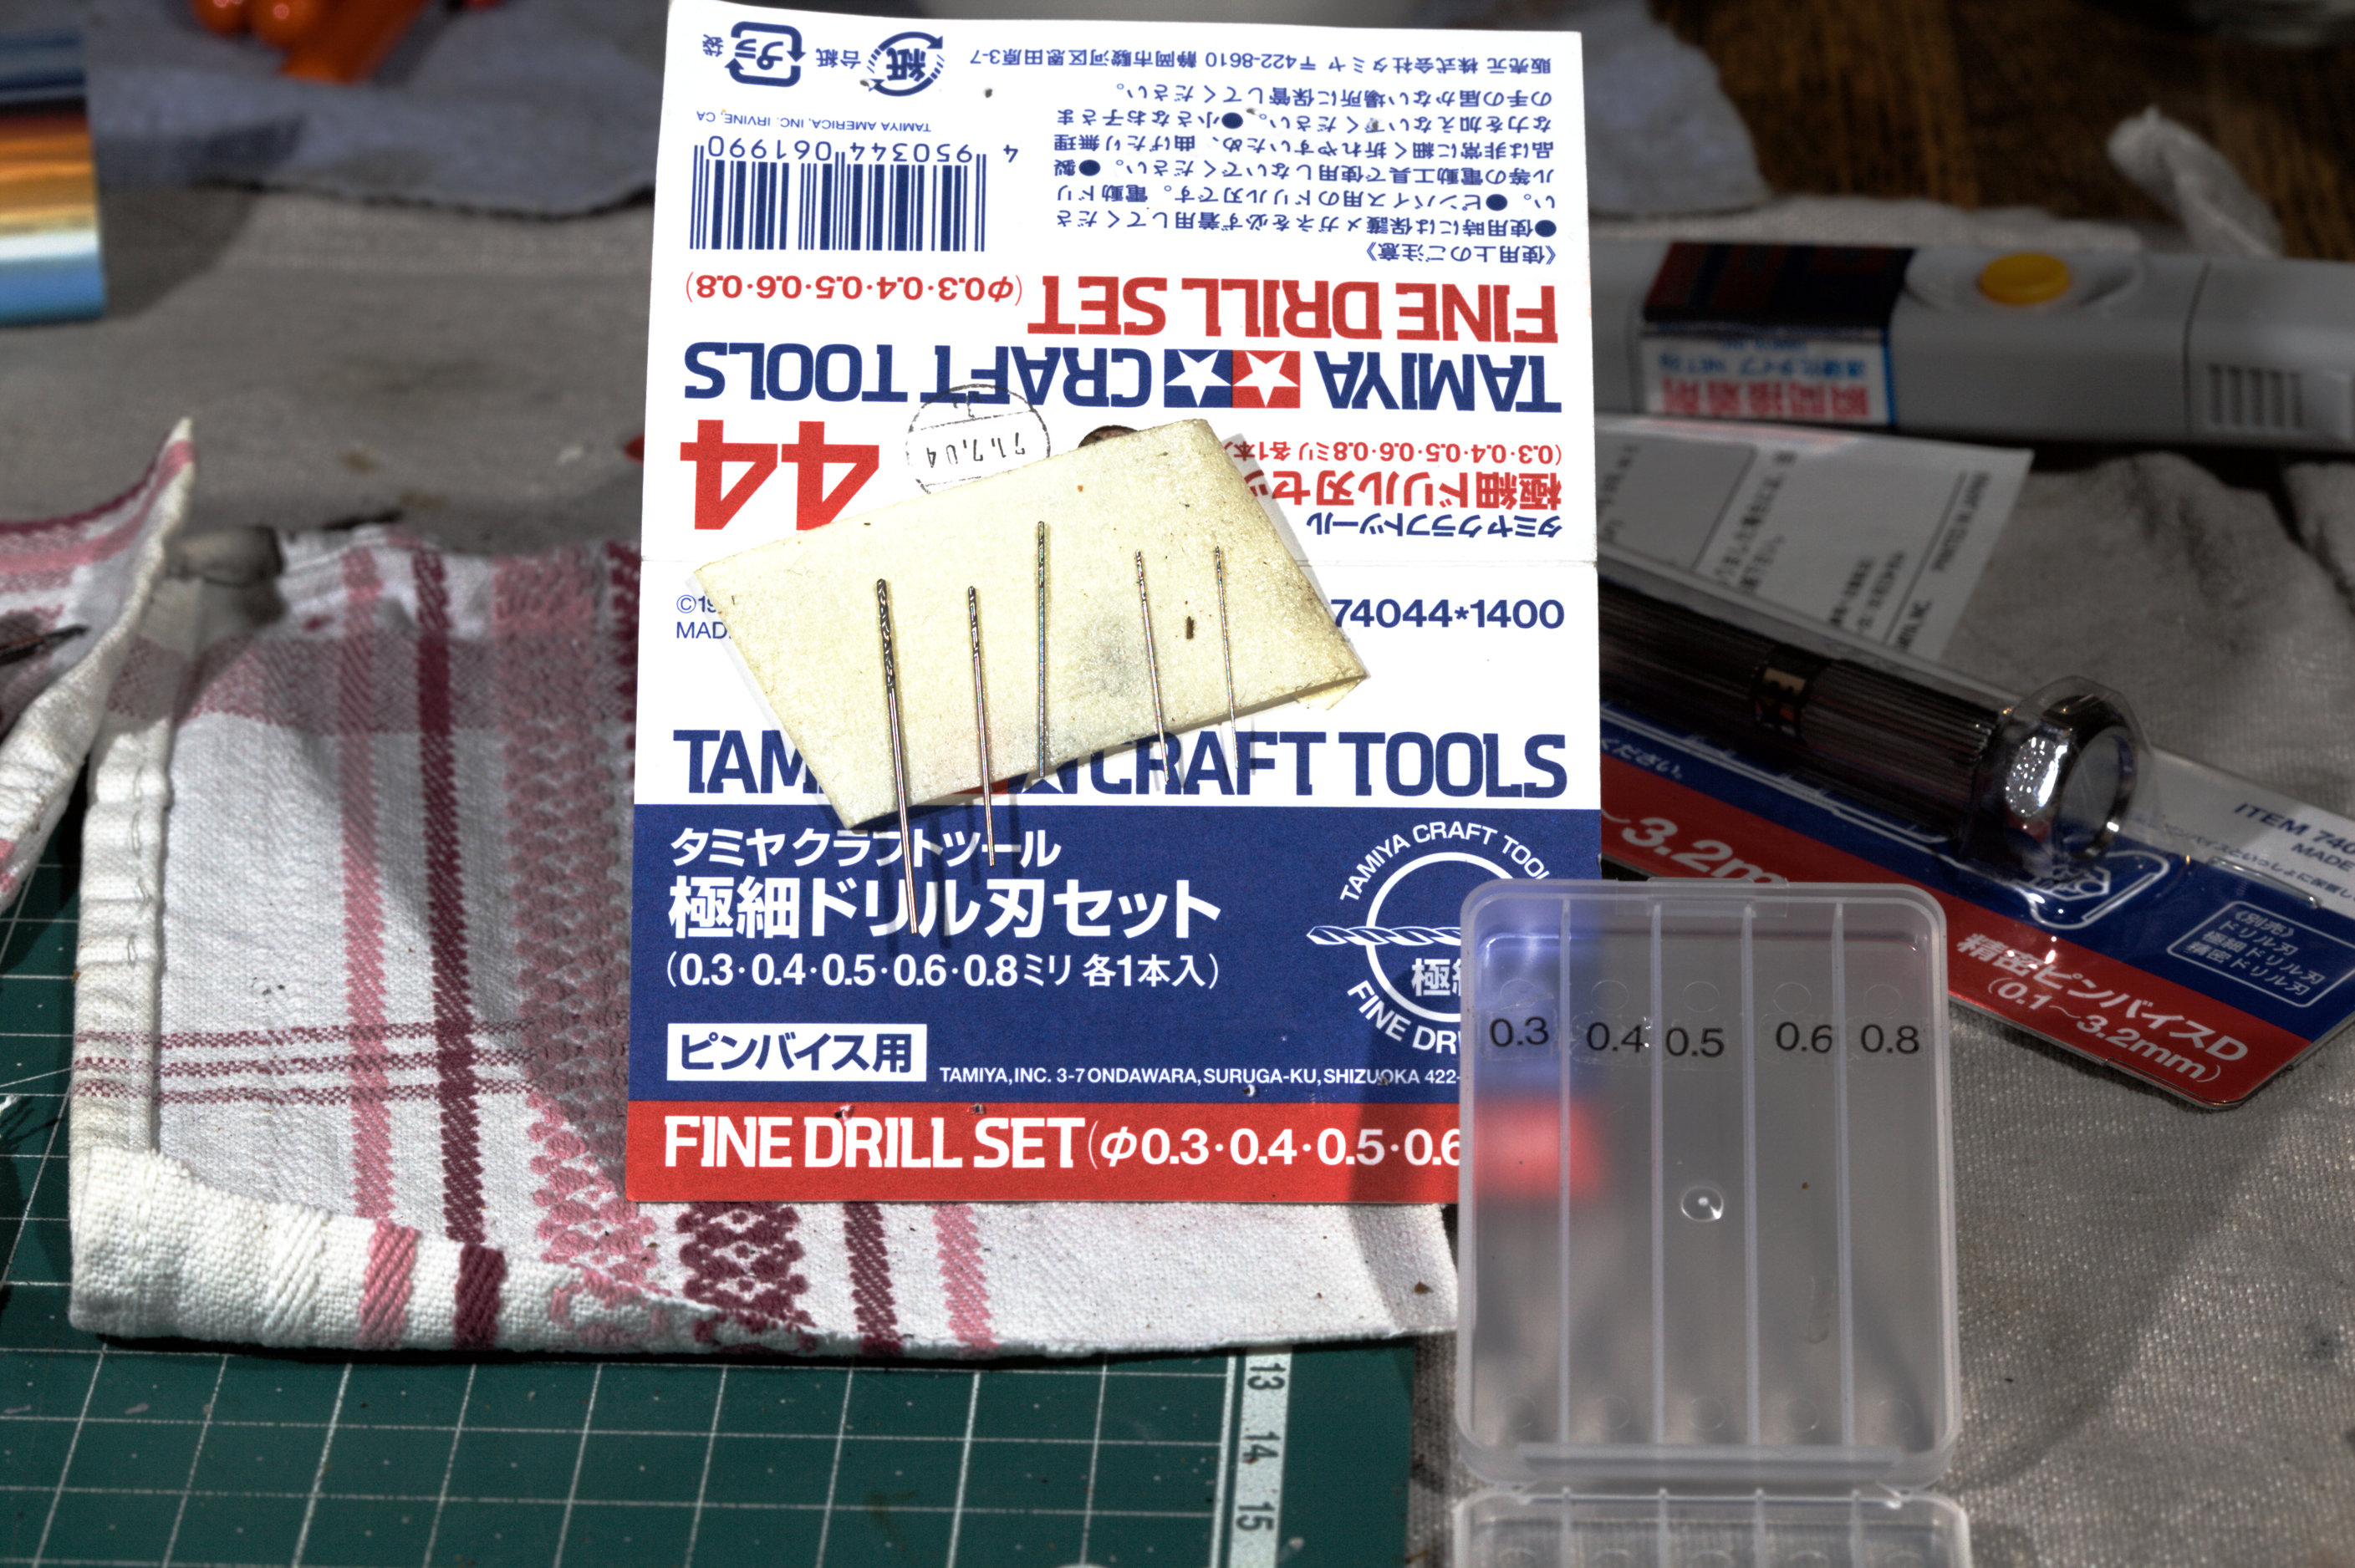 Fine Drill Set